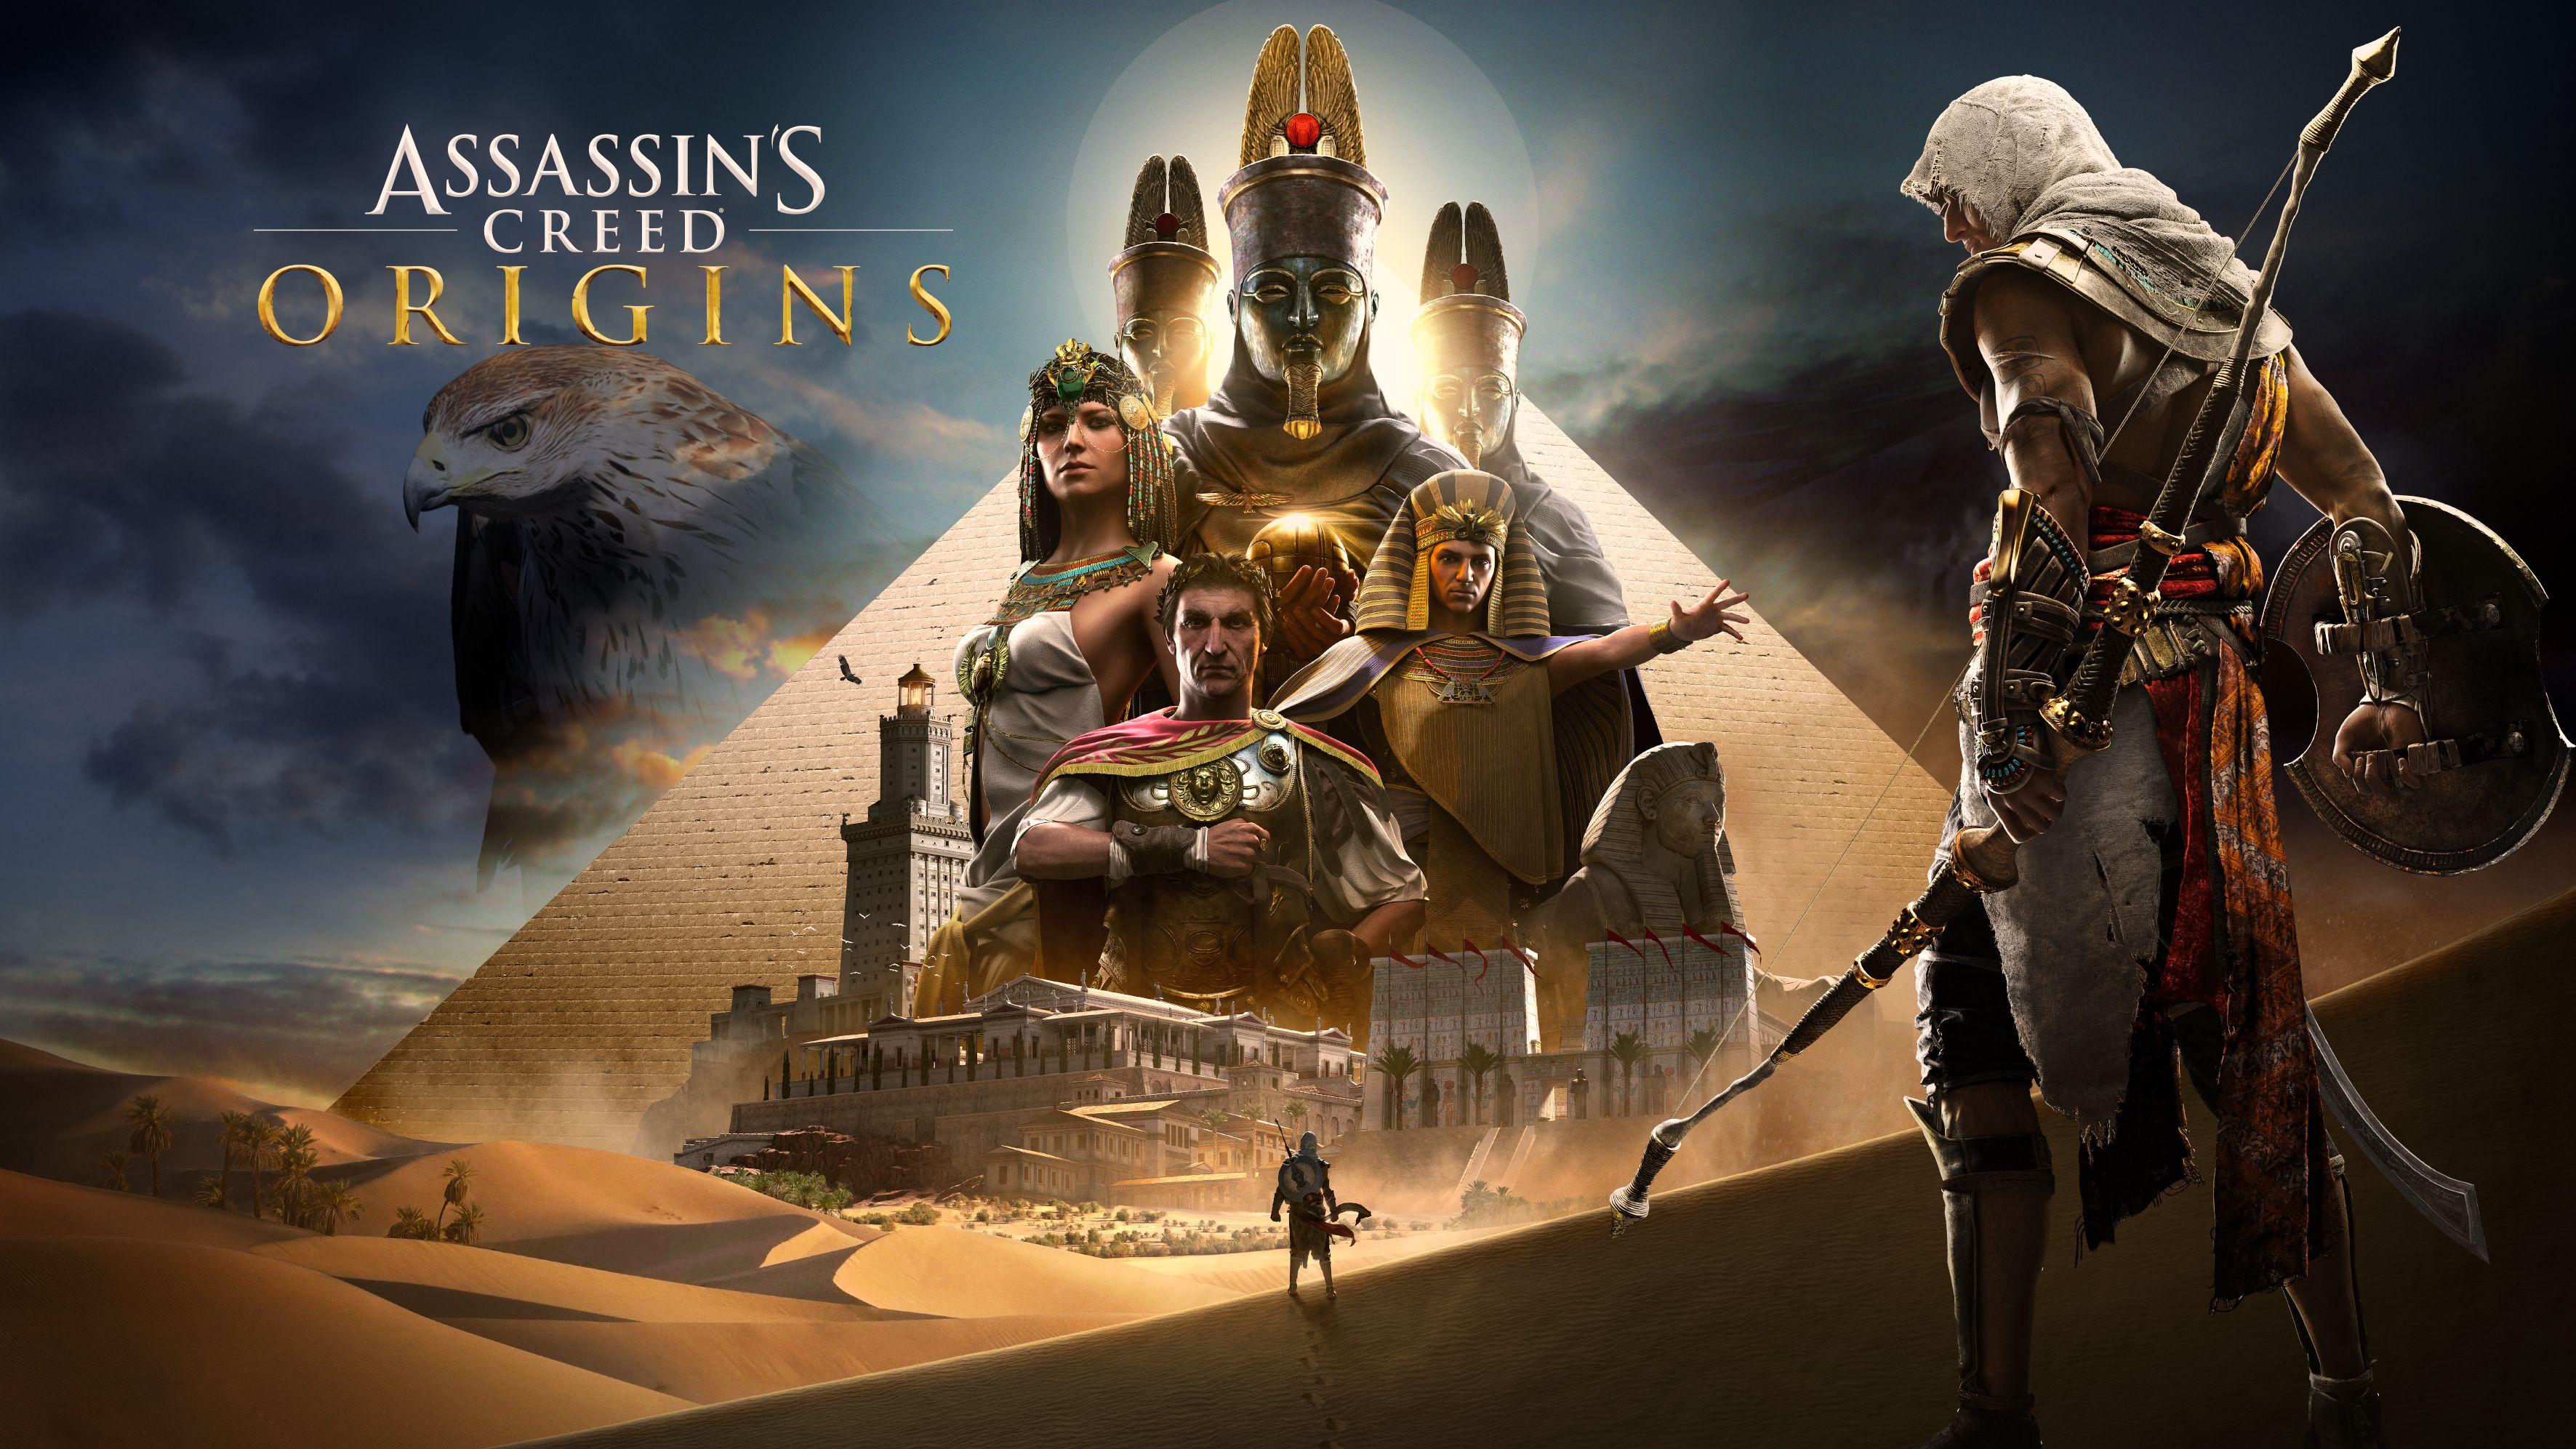 Assassins Creed Origins Wallpaper 1920x1080 Assassins Creed